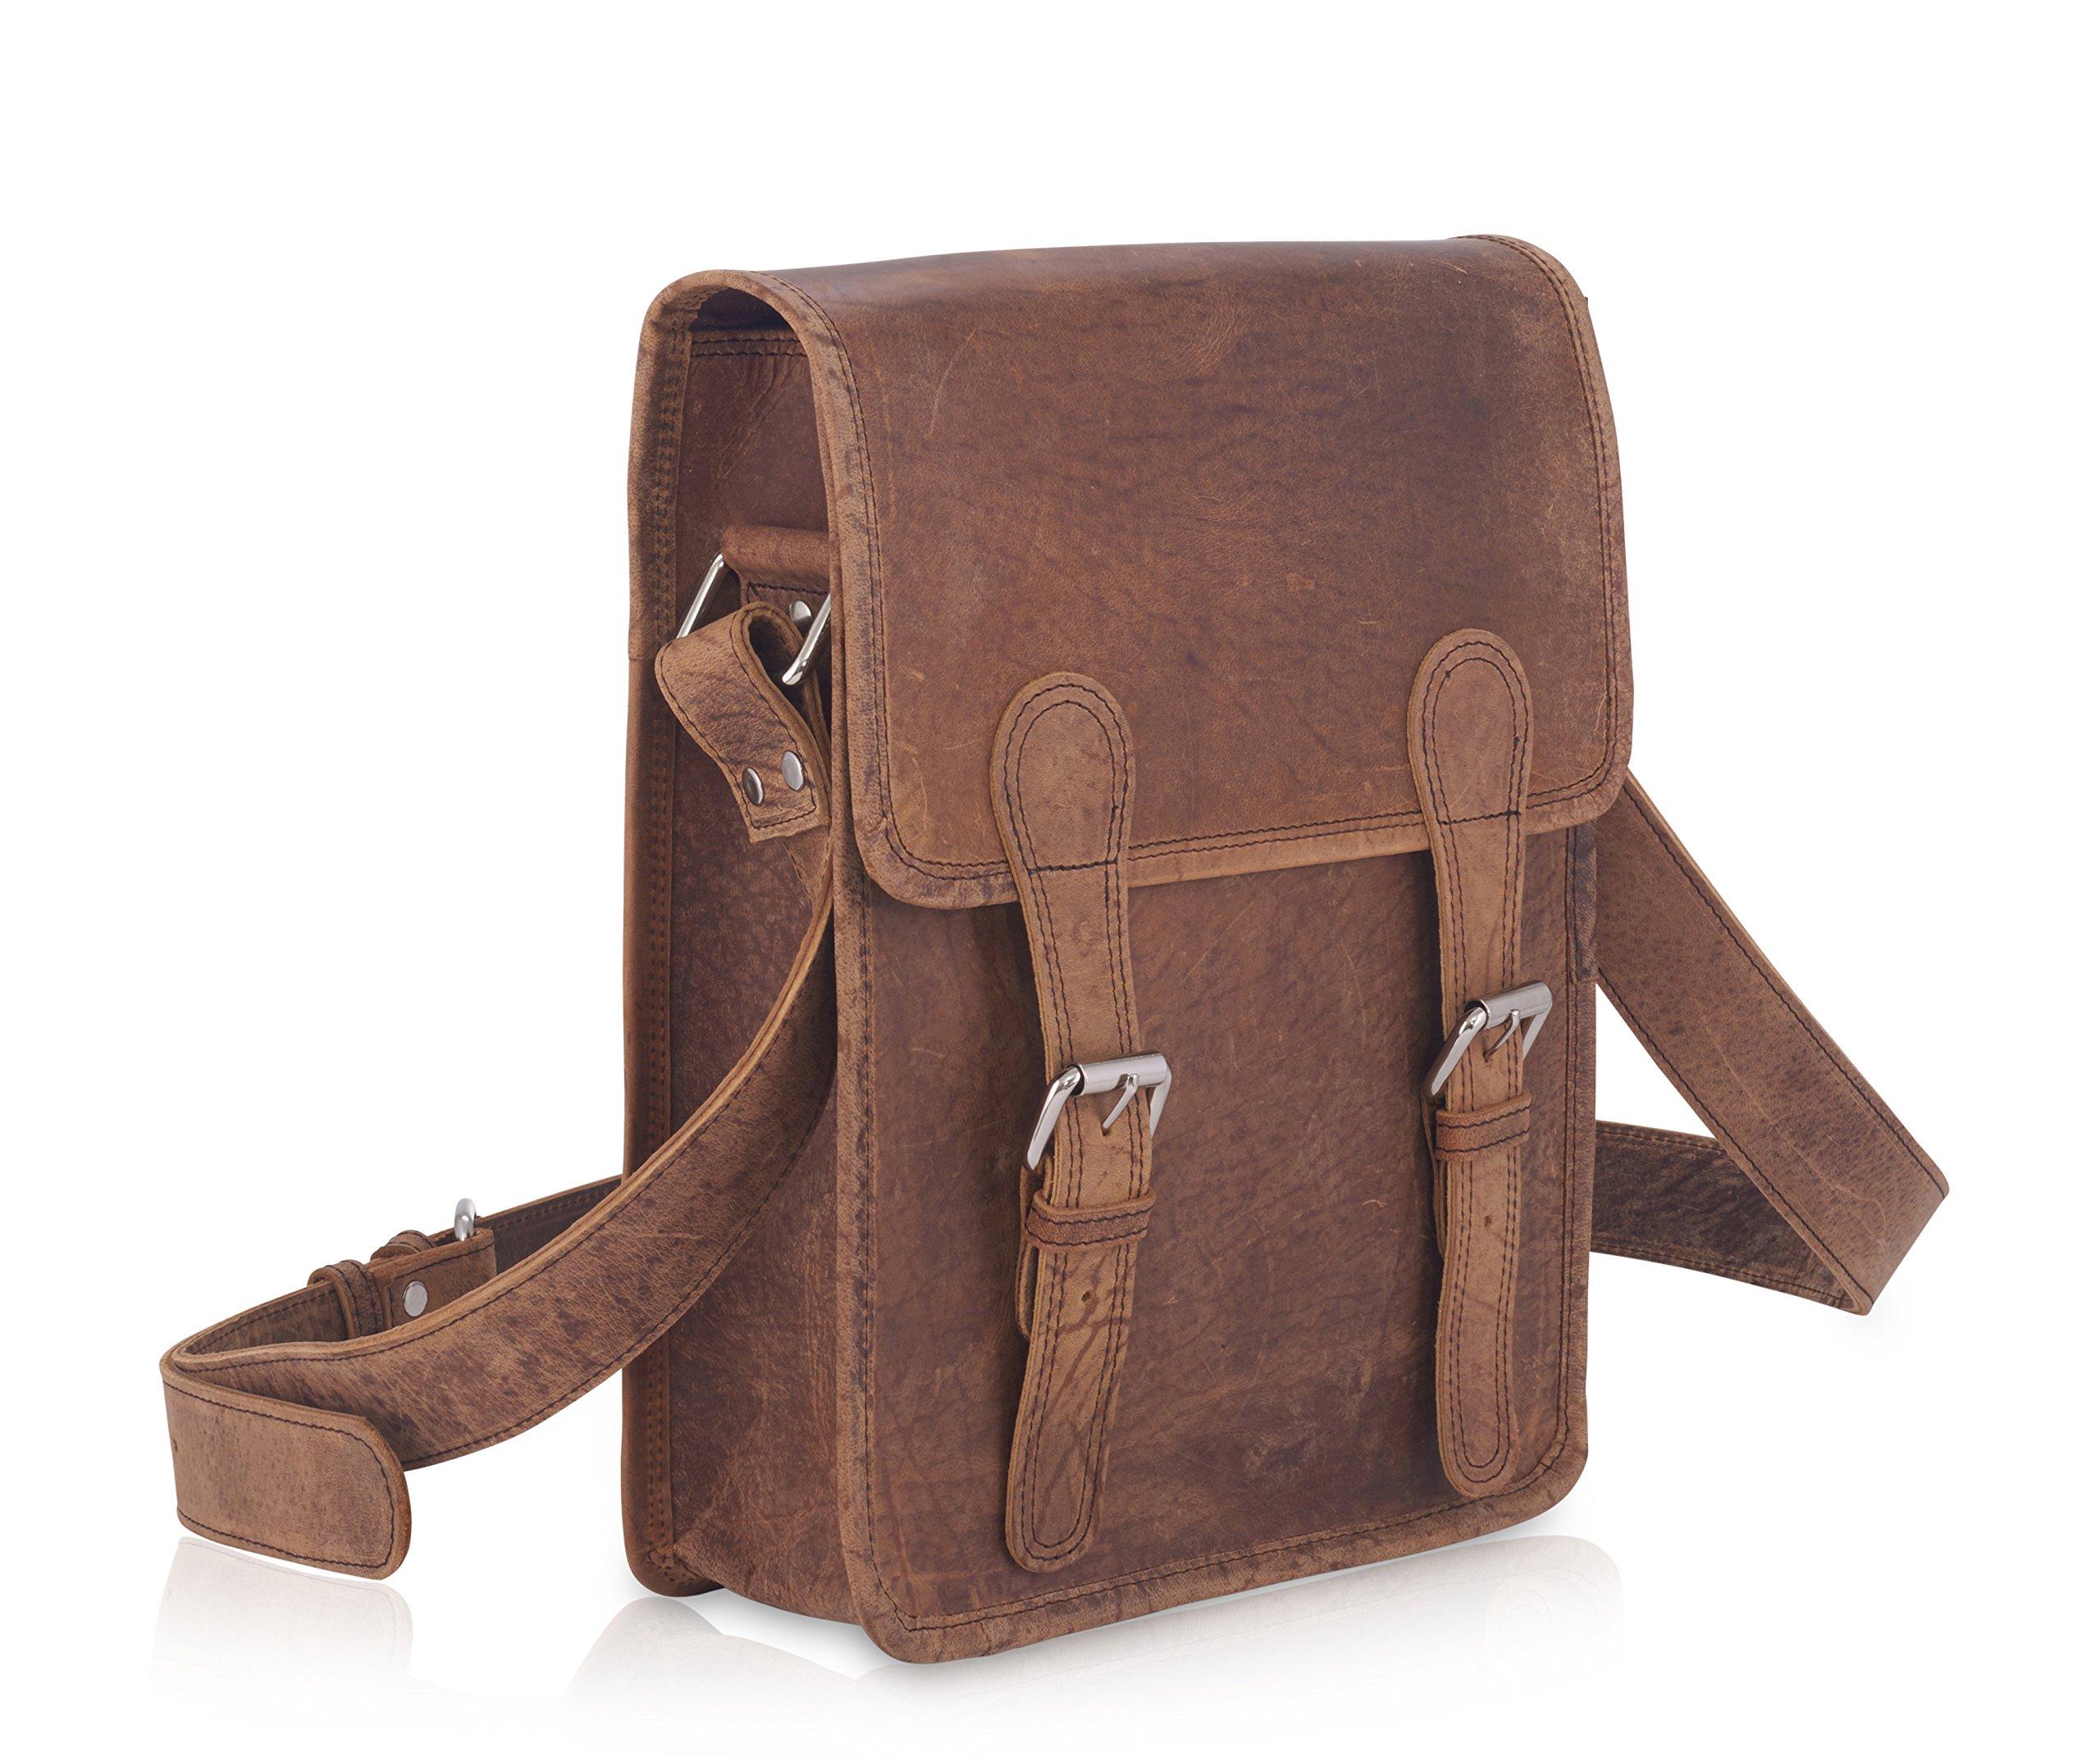 Komalc 11 Inch Vintage Hunter Leather Satchel for Ipad / TabletsSALE by KomalC (Image #2)